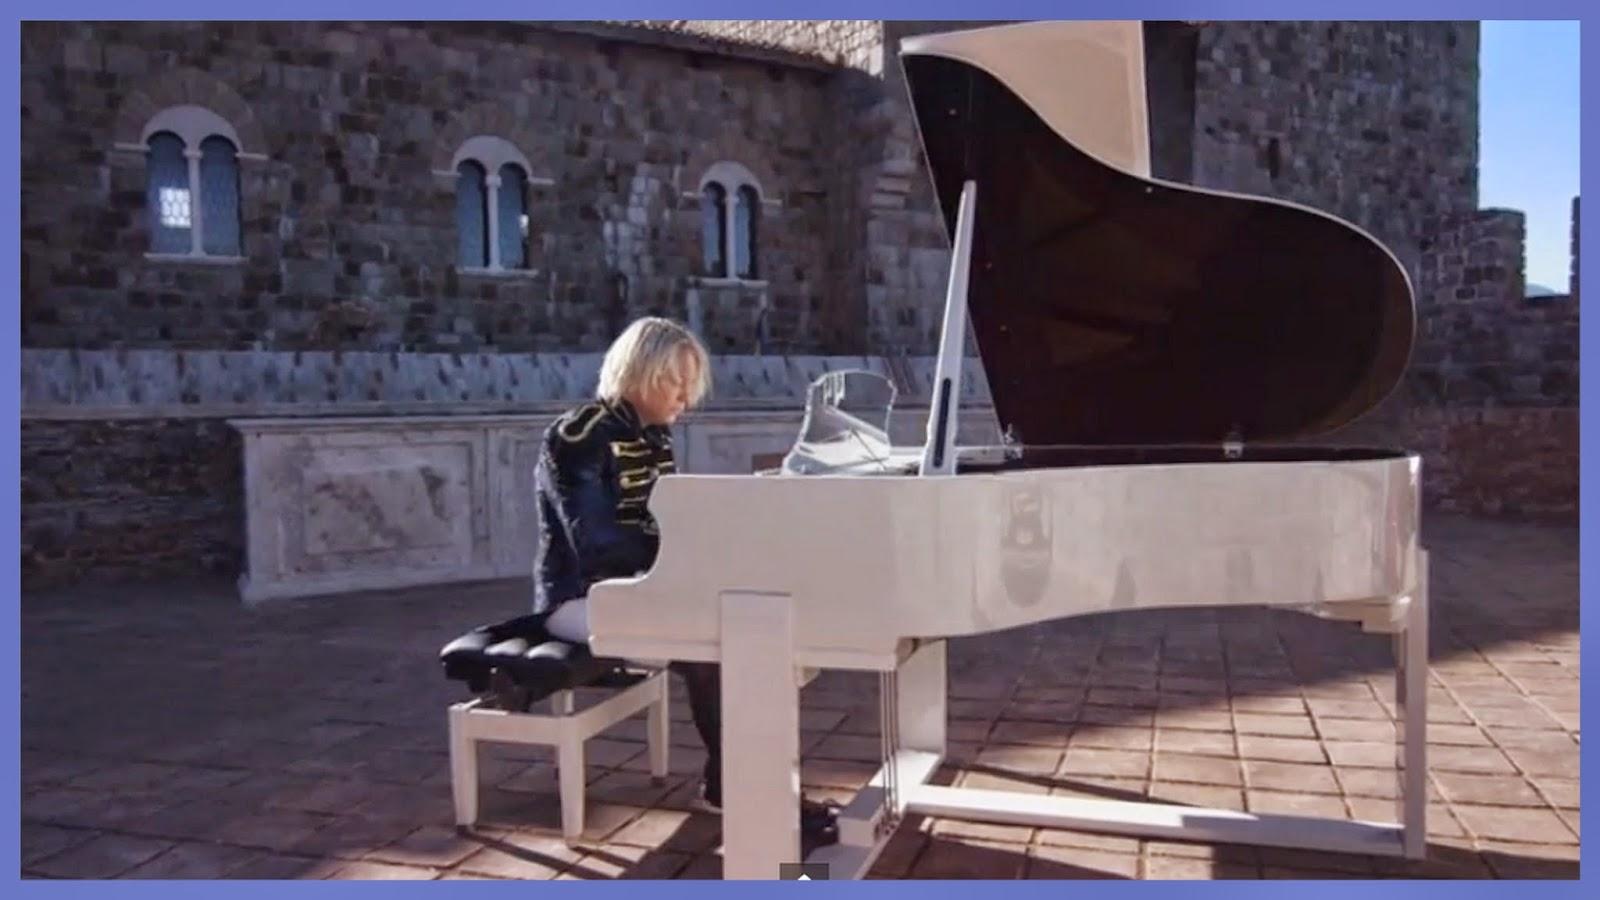 Harry Potter Theme Song Piano Sheet Music Jarrod Radnich